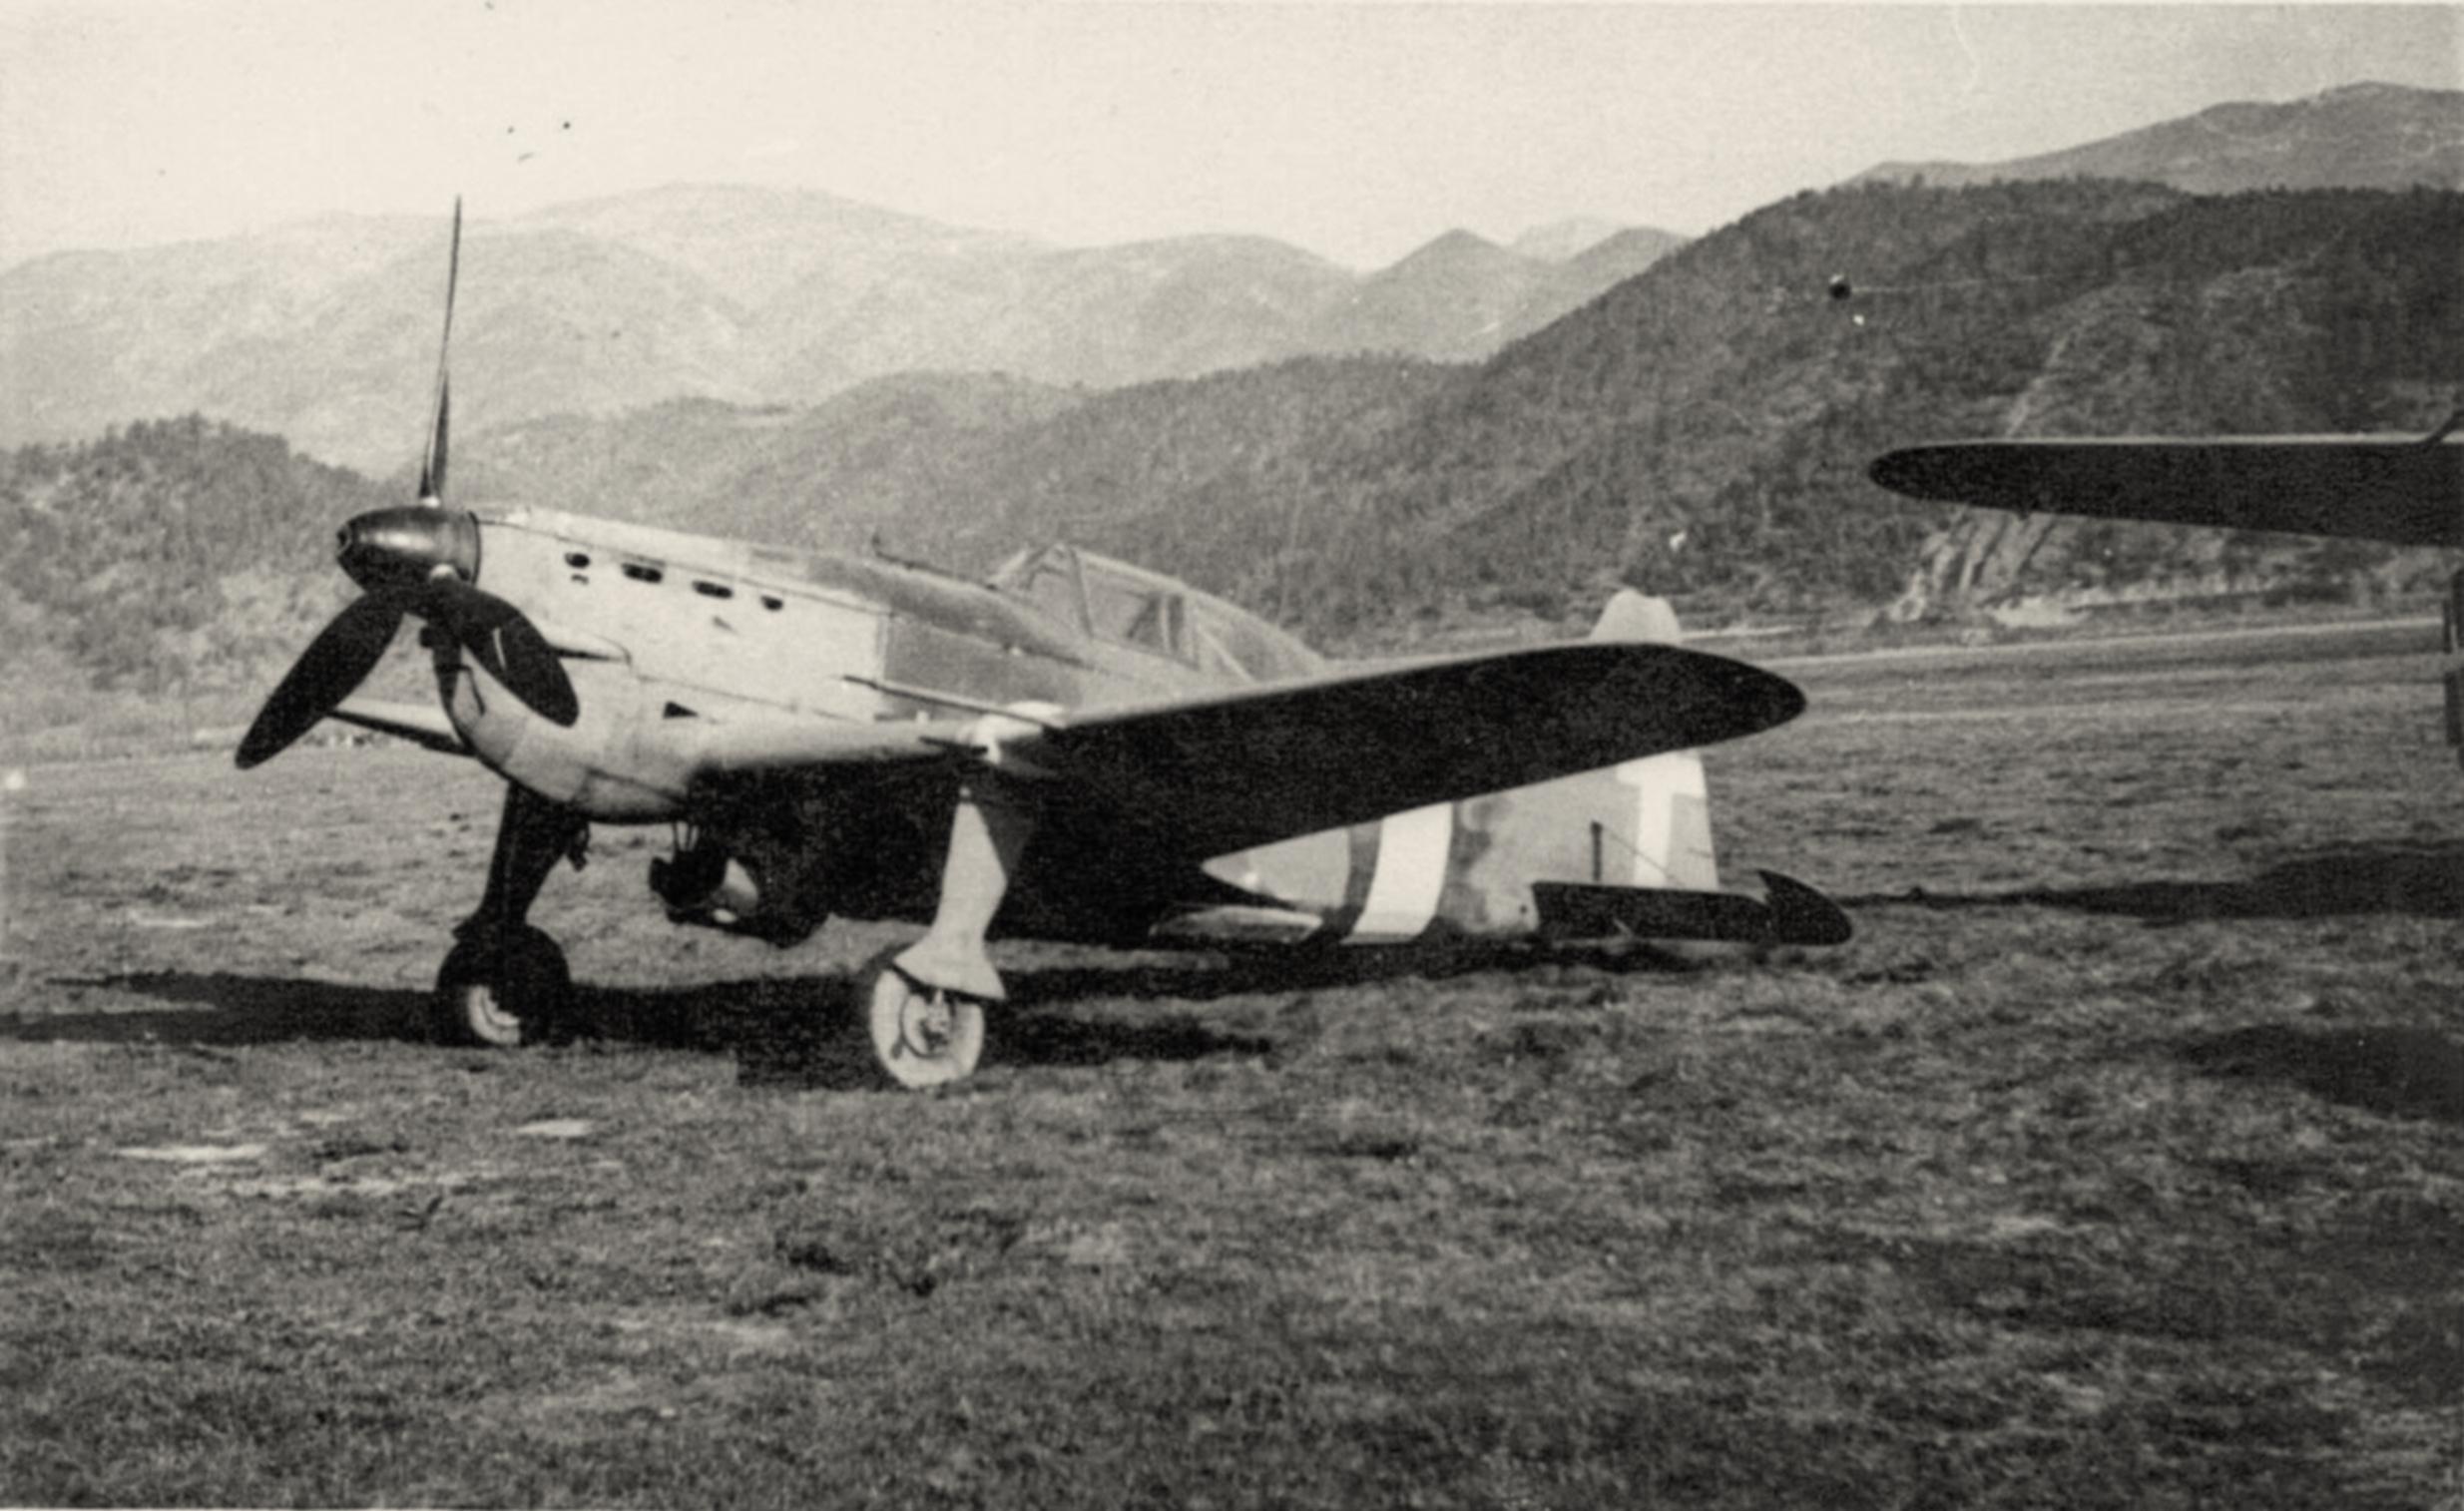 Regia Aeronautica Morane Saulnier MS 406C Italy ebay 01